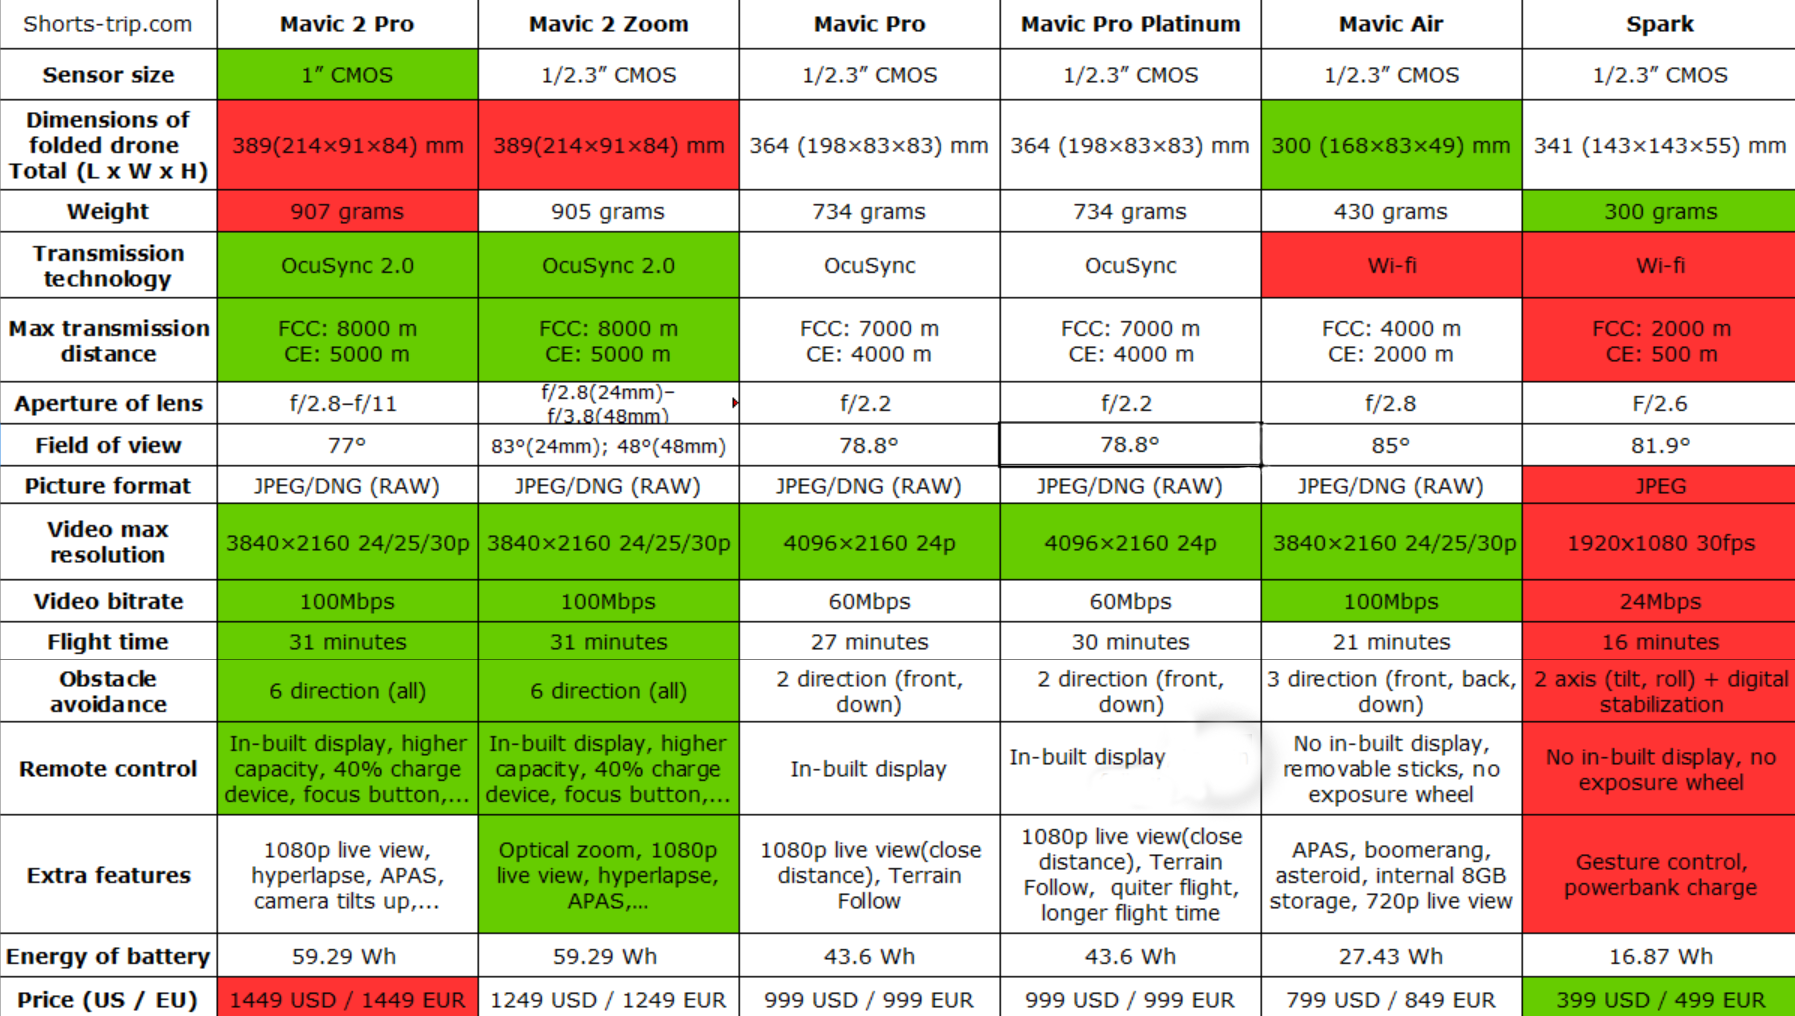 best travel drone, mavic air vs mavic pro vs spark, which mavic is best, table mavic parameters, mavic comparison, mavic air